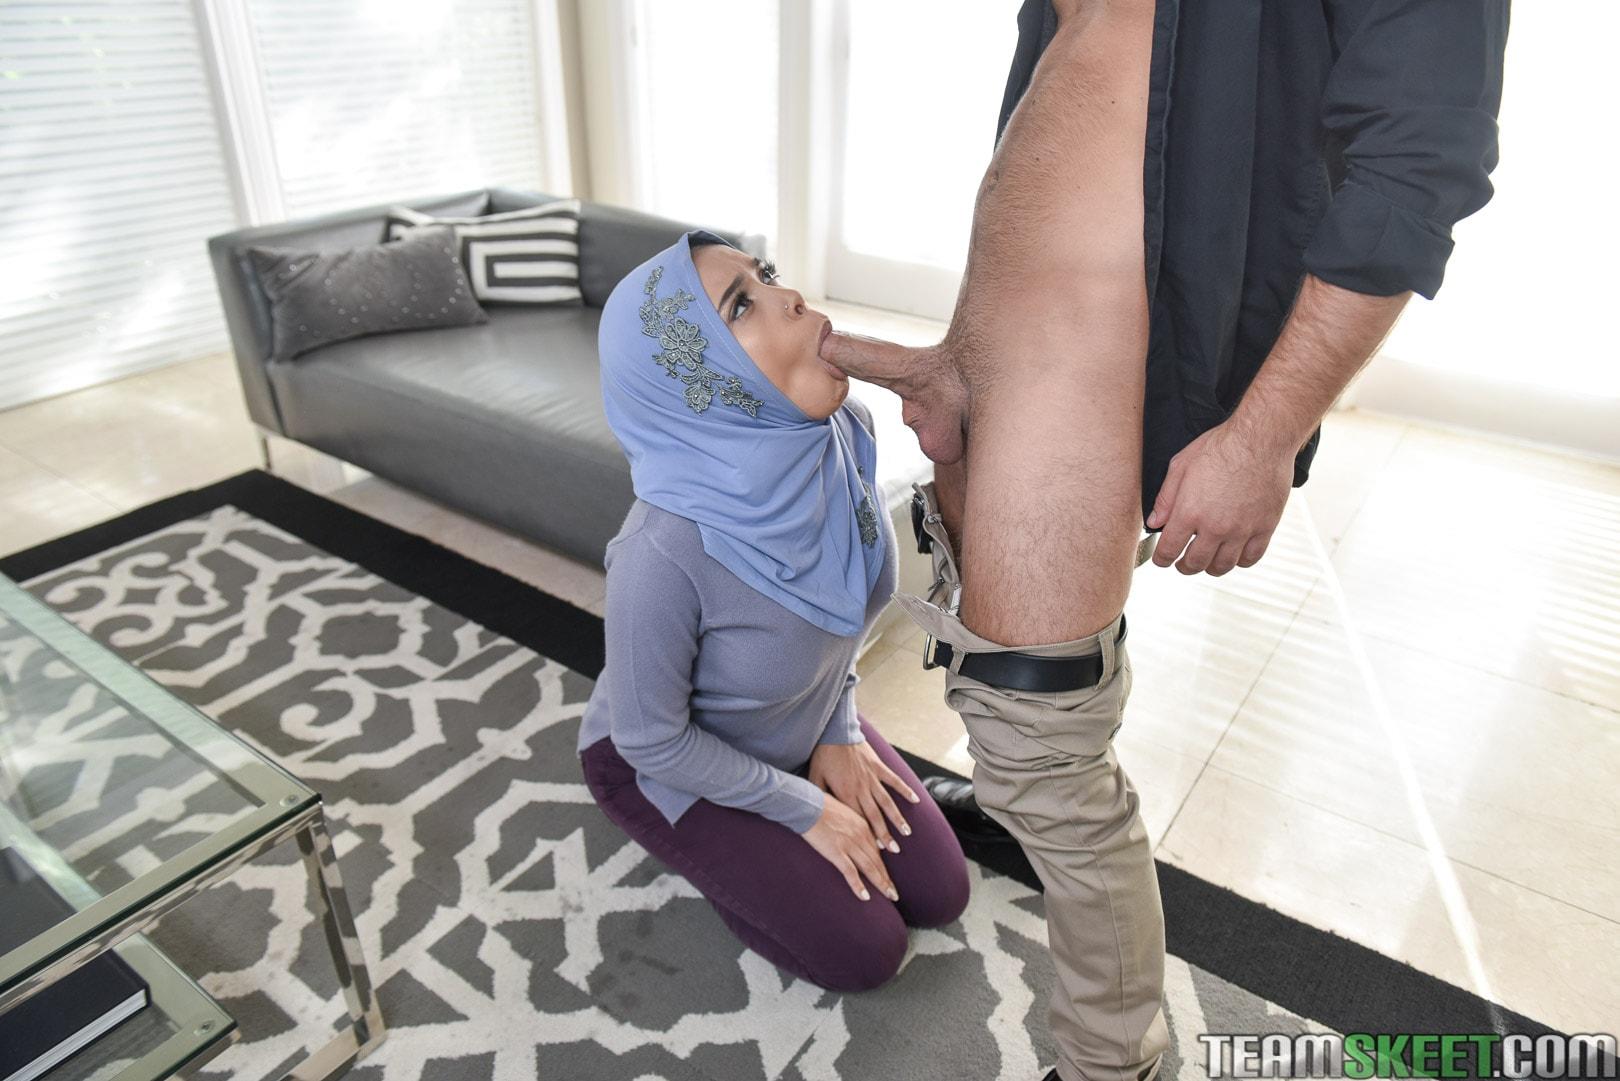 Team Skeet 'Teenage Anal In Her Hijab' starring Aaliyah Hadid (Photo 144)